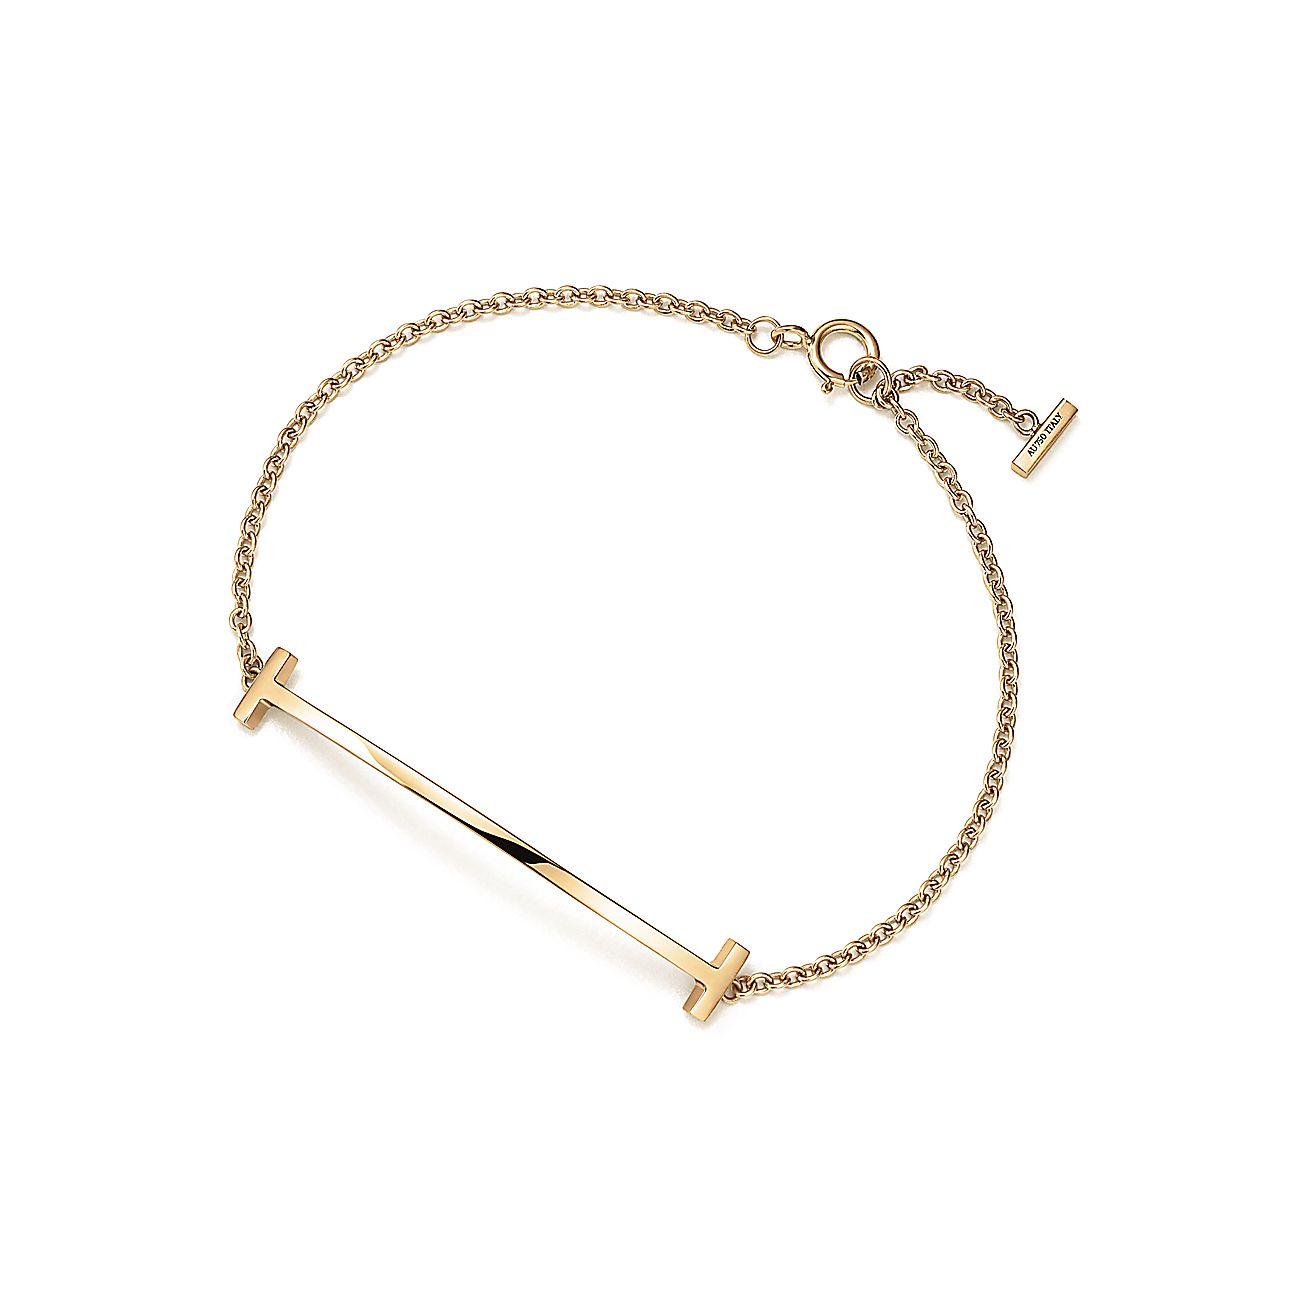 tiffany t smile bracelet in 18k gold medium tiffany co. Black Bedroom Furniture Sets. Home Design Ideas